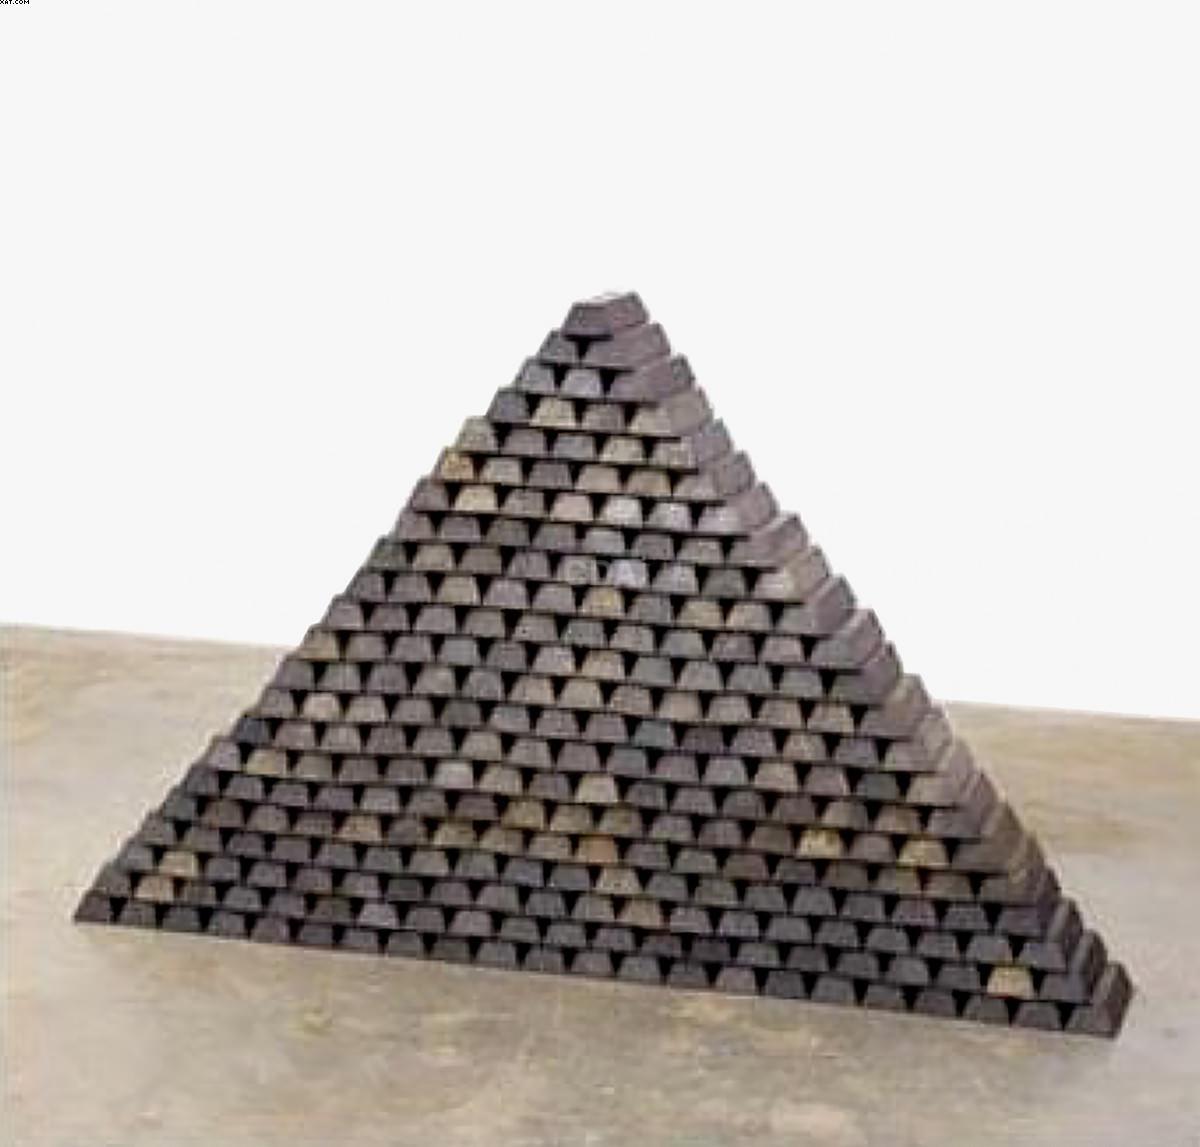 Black gold  - Jose Bento - José Bento Franco Chaves